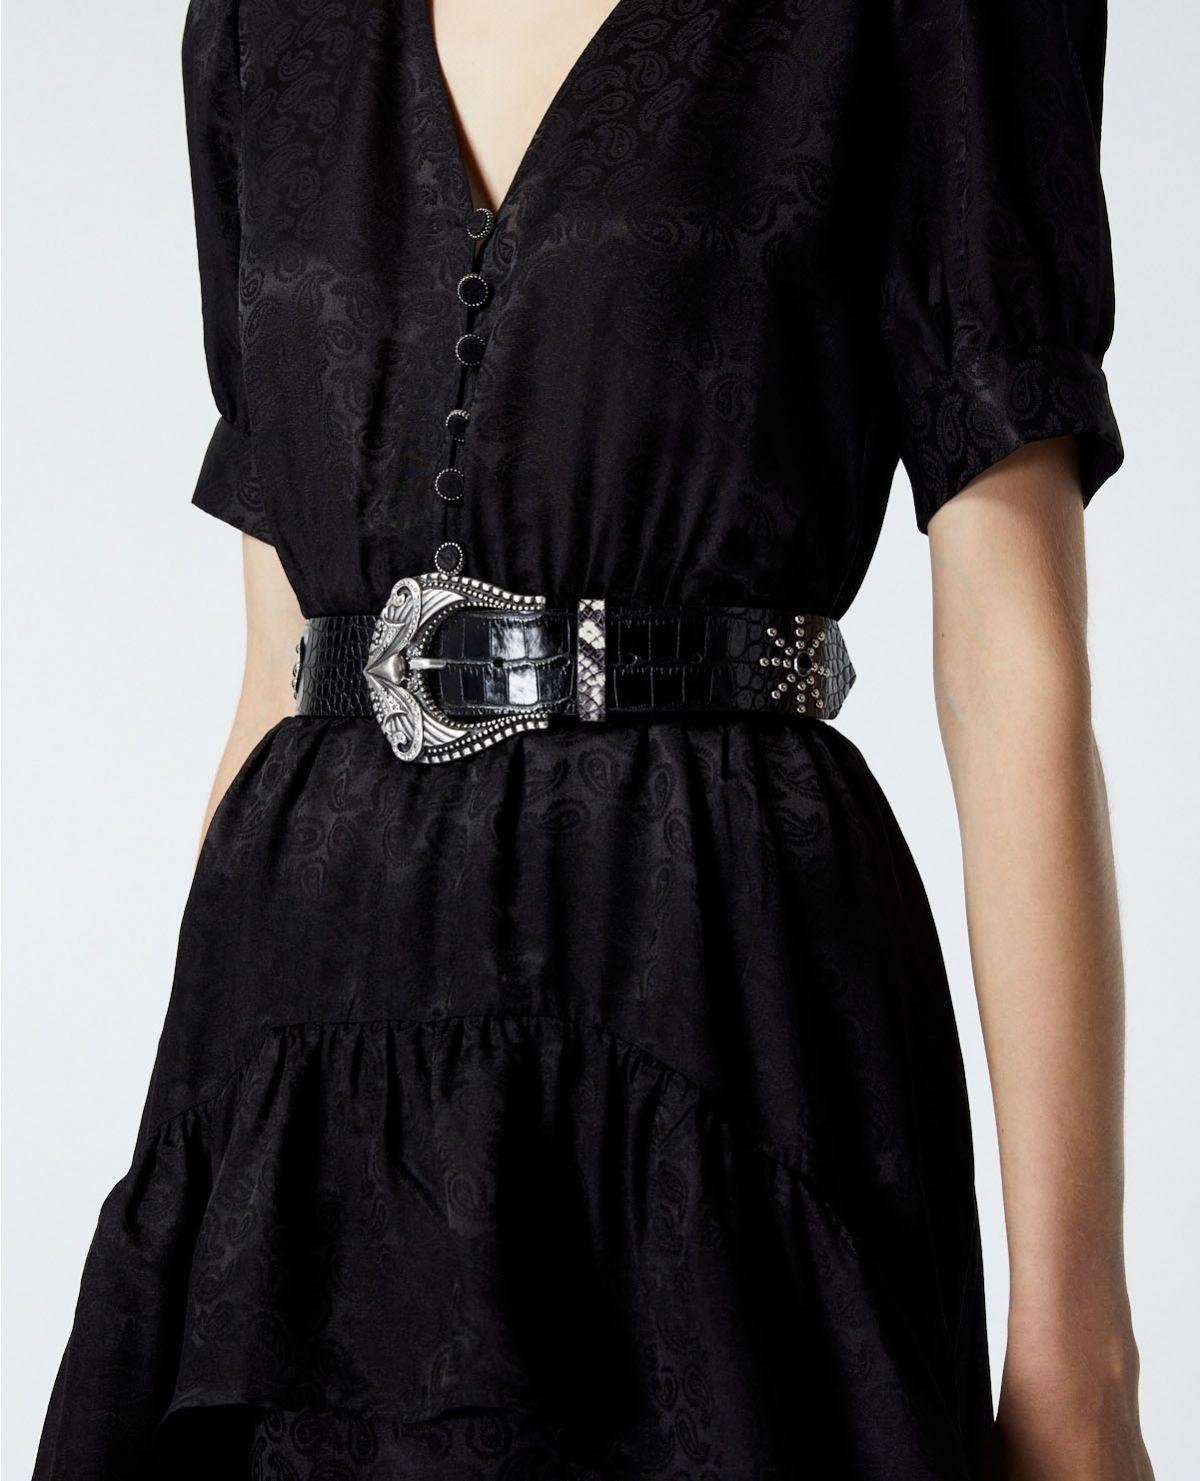 THE KOOPLES ceinture cuir noir effet python strassé-2